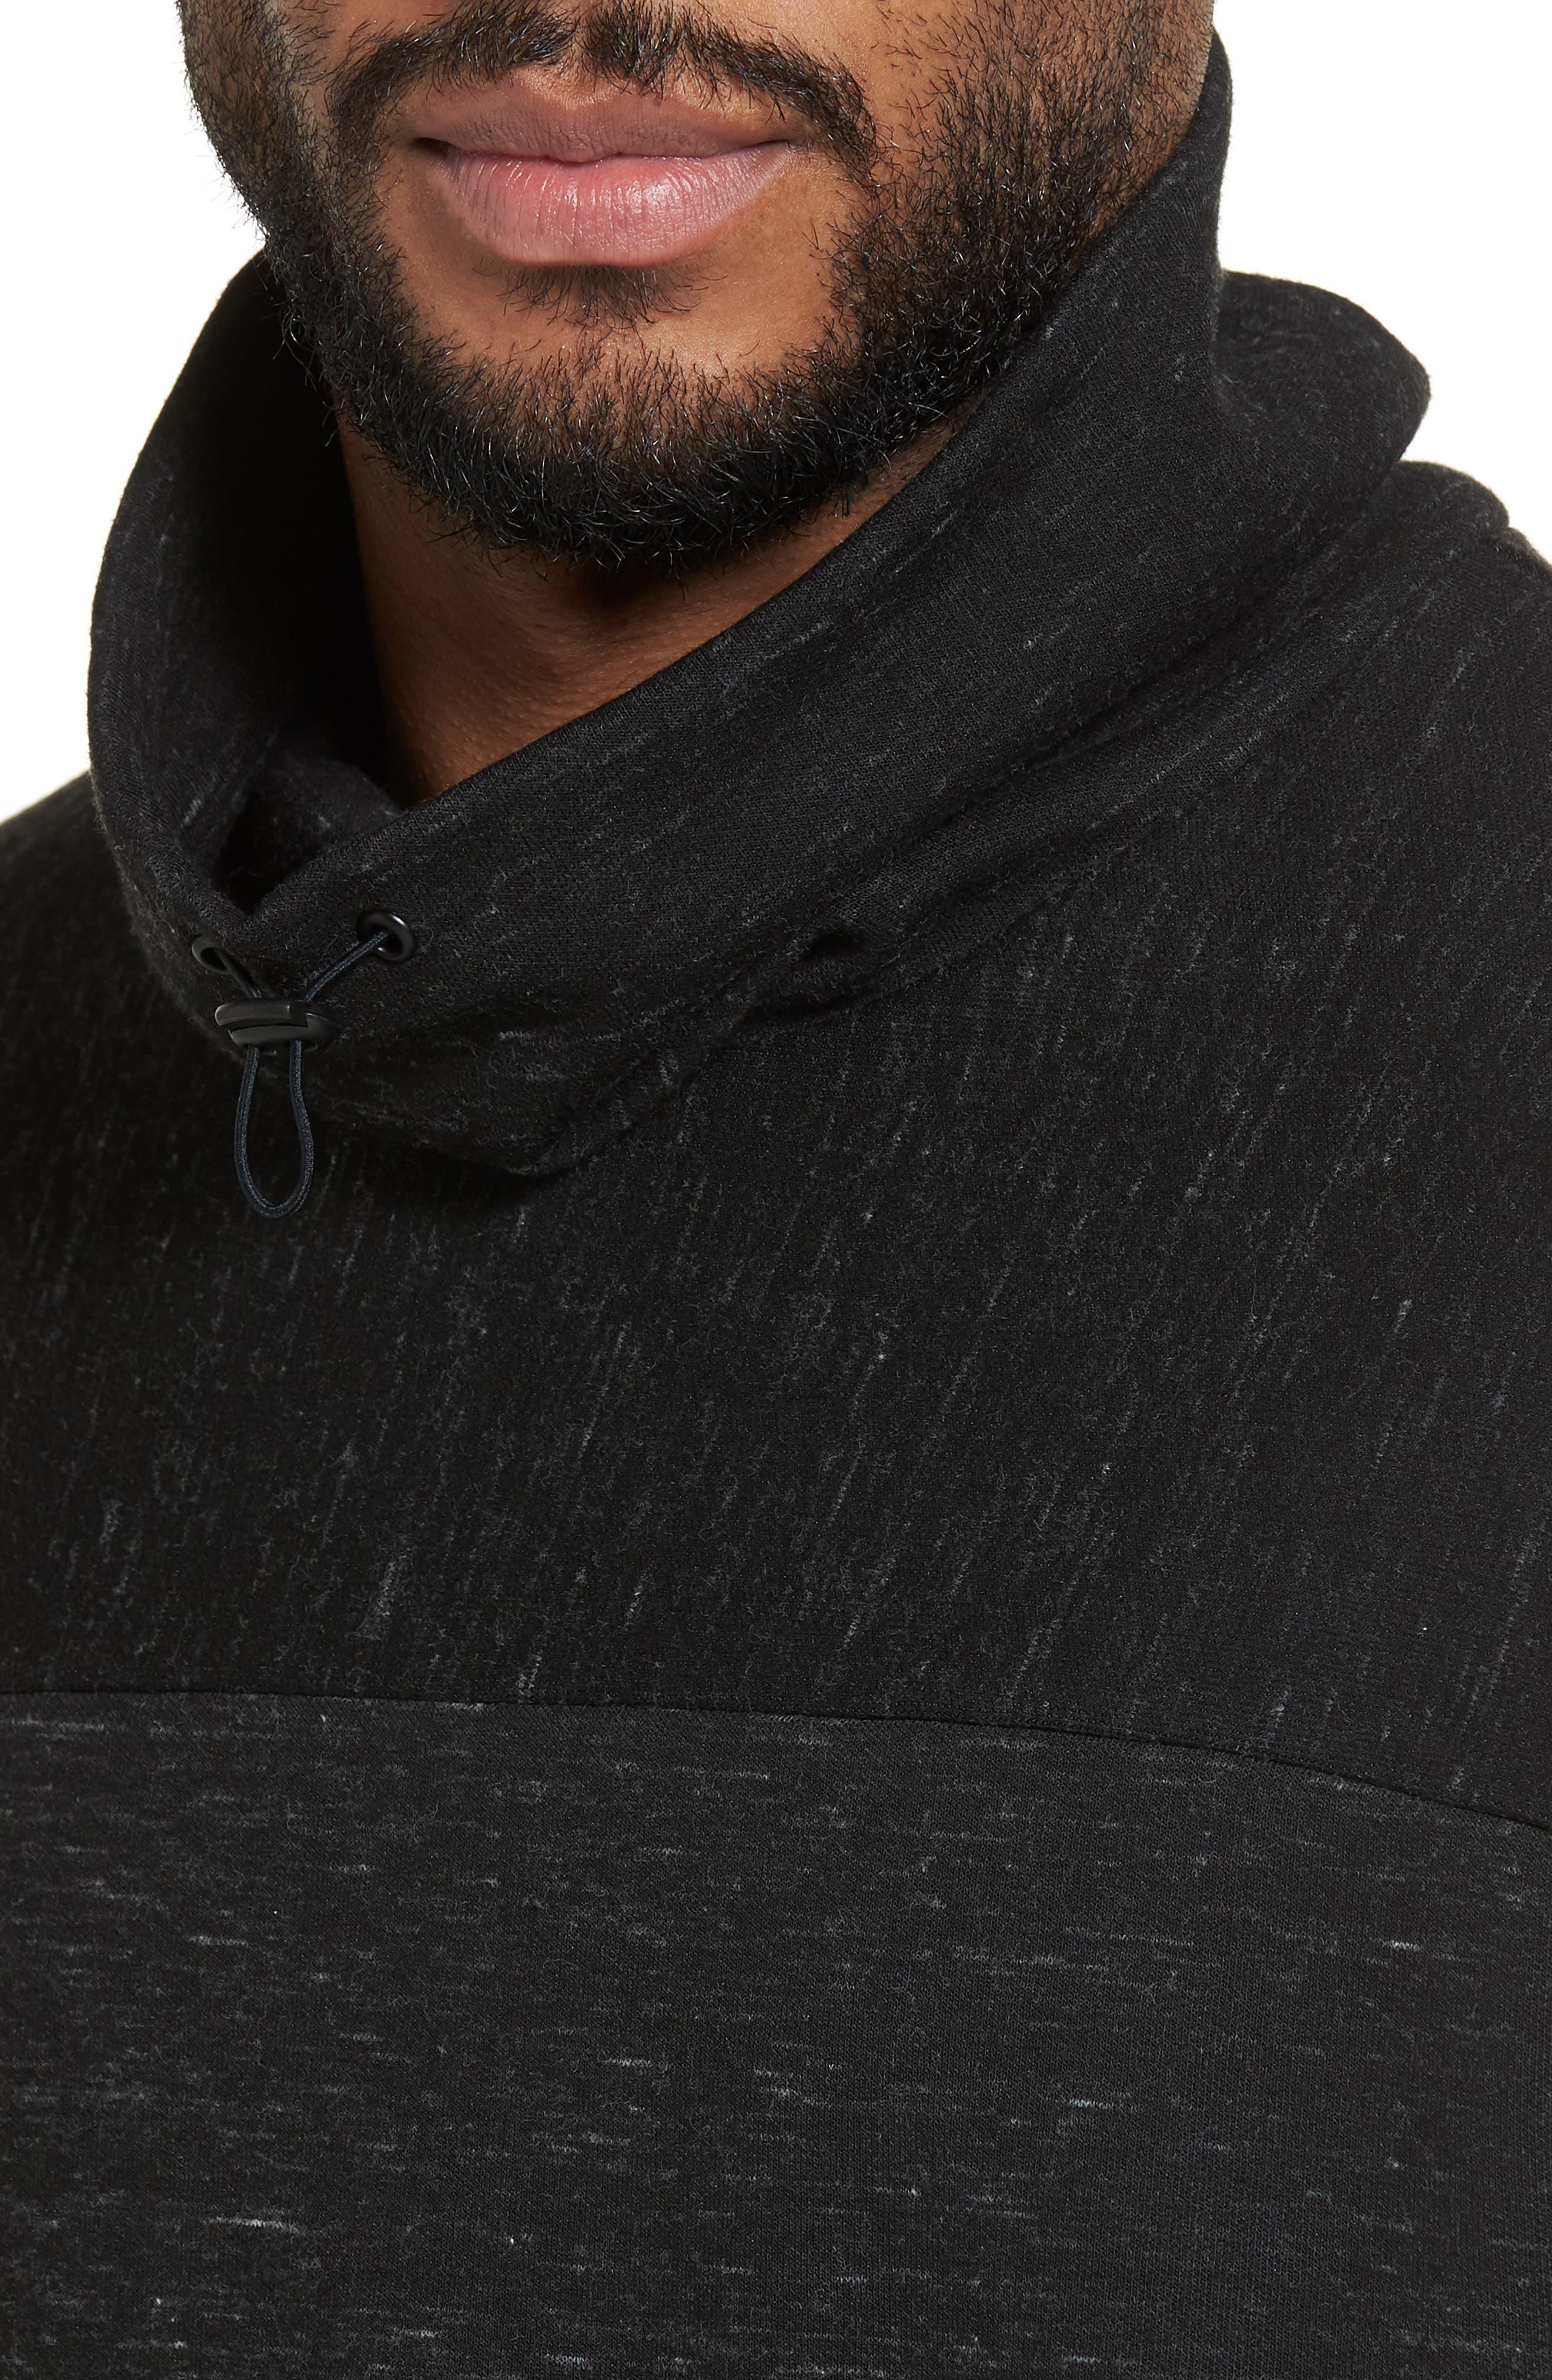 Space Dye Fleece Pullover,                             Alternate thumbnail 4, color,